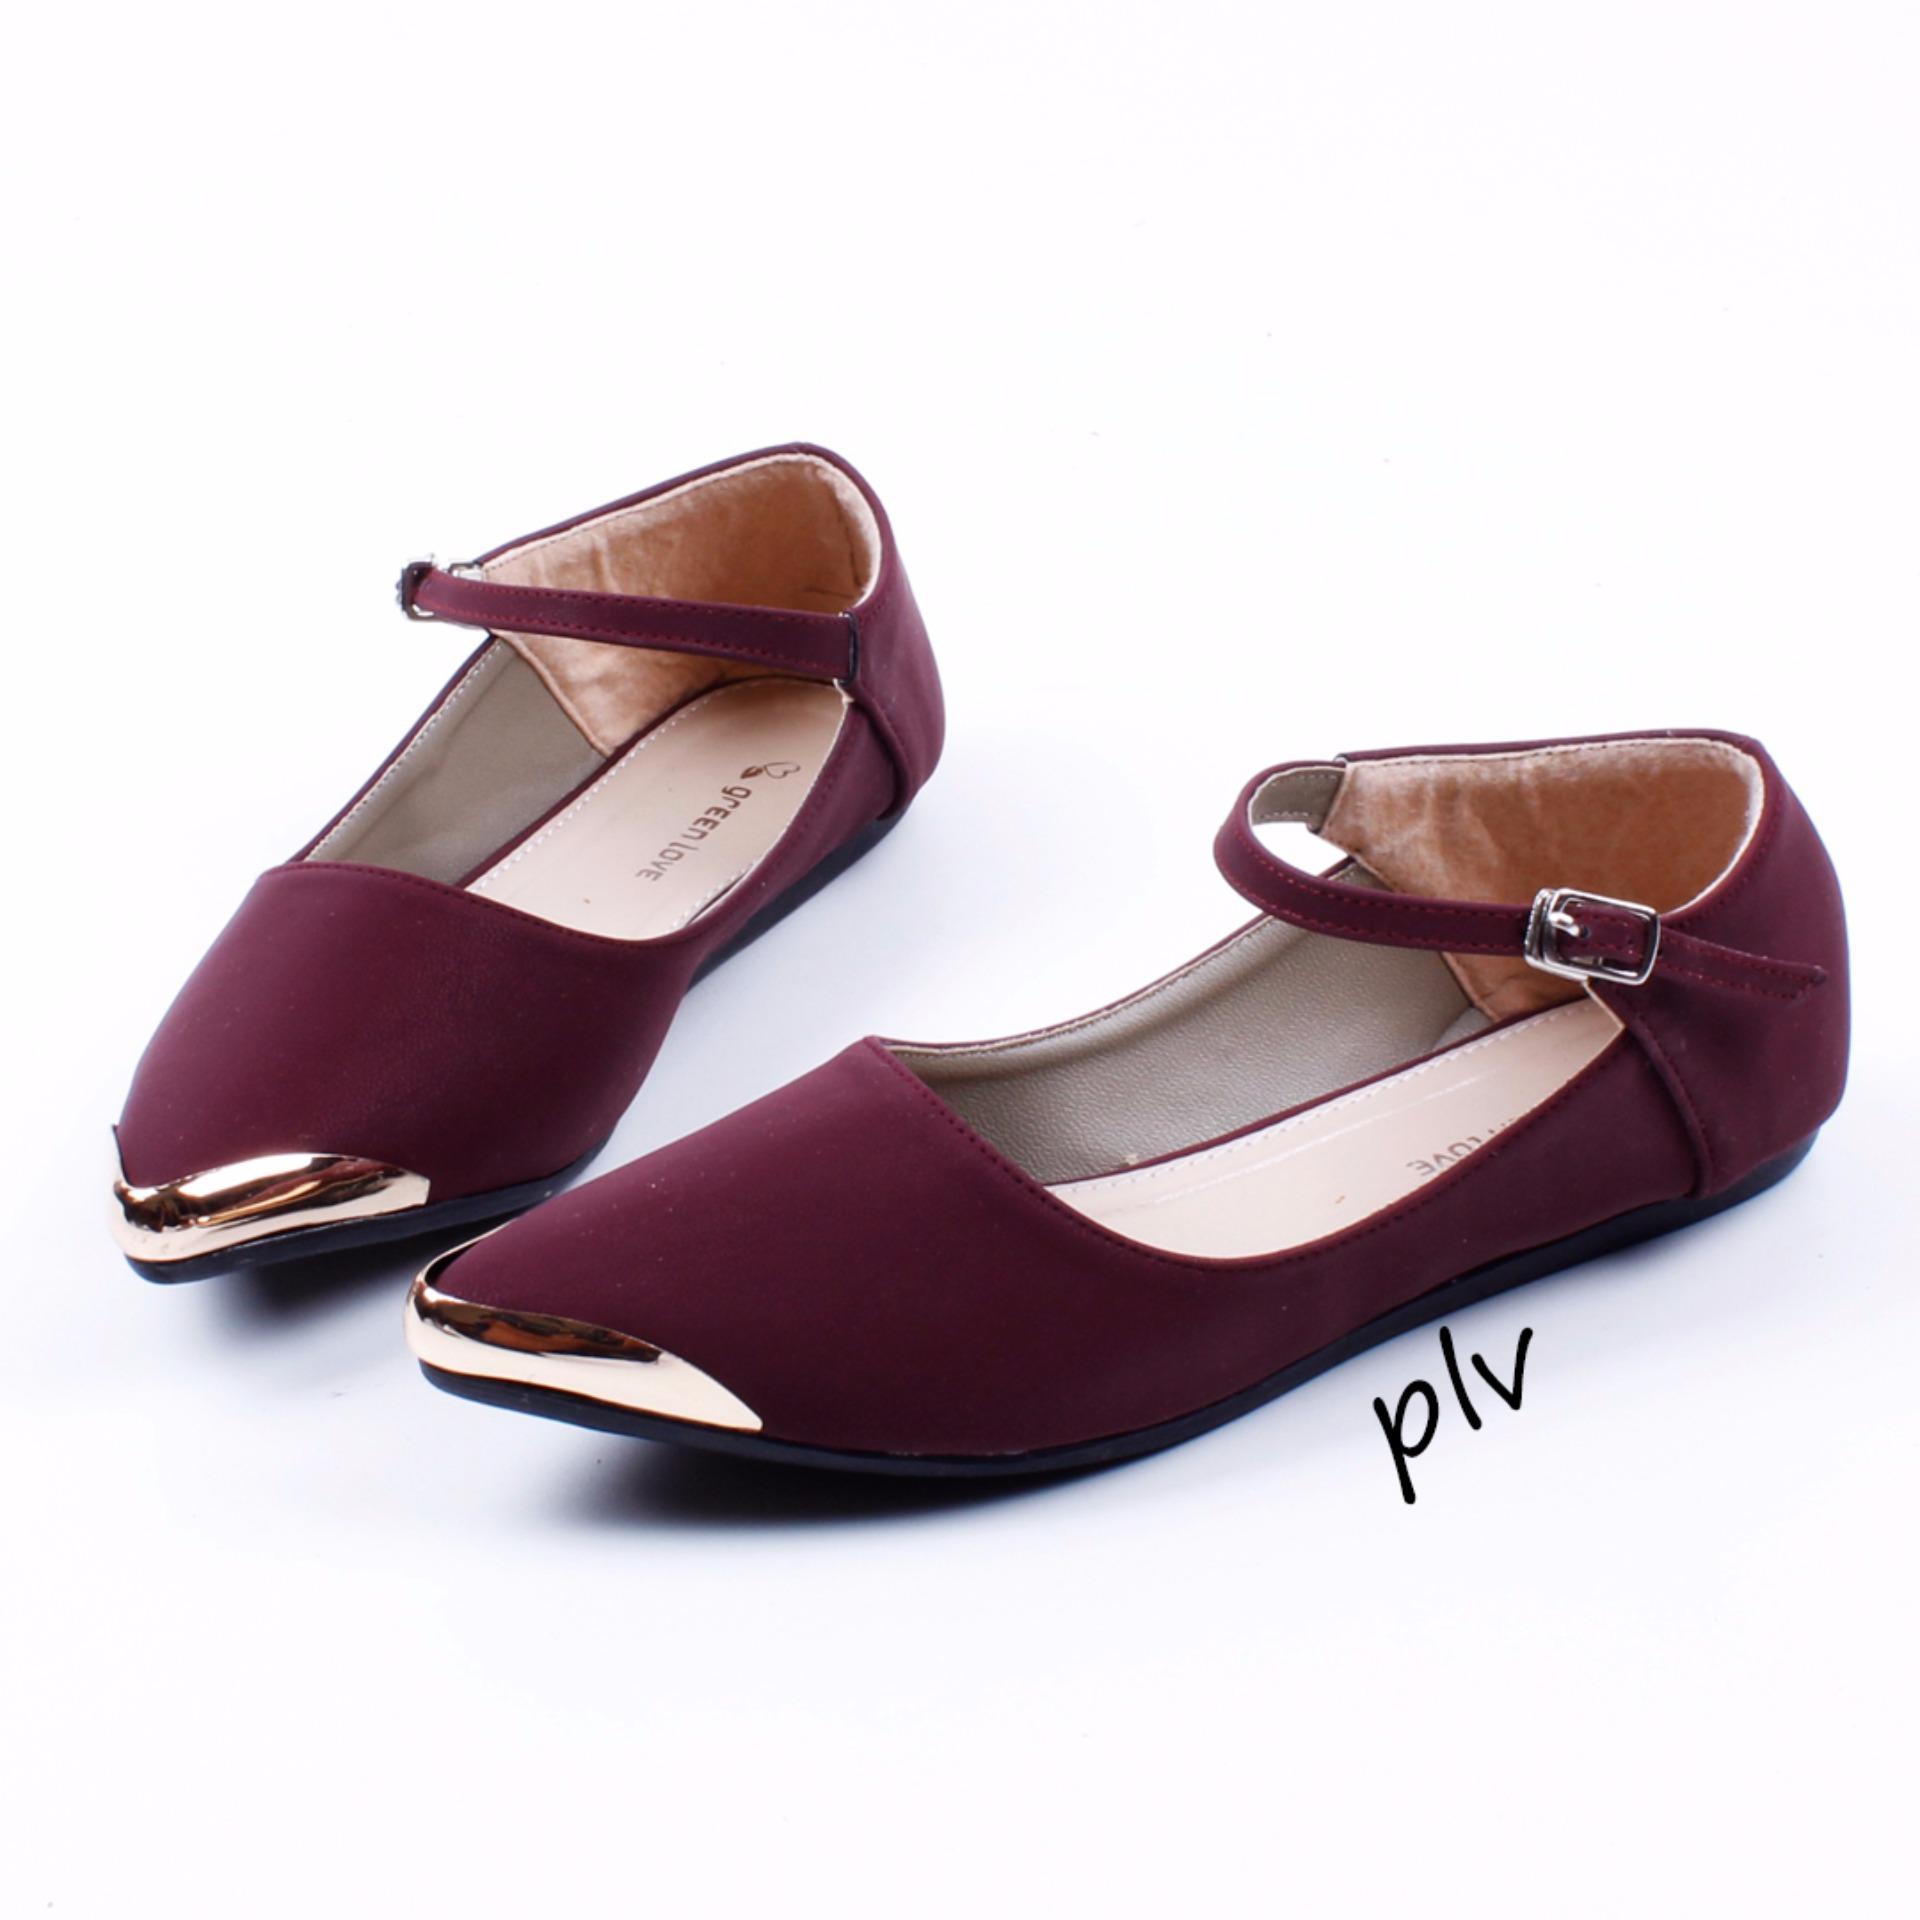 Beli Sepatu Wanita Flat Shoes Mary Jane Ag06 Maroon Pluvia